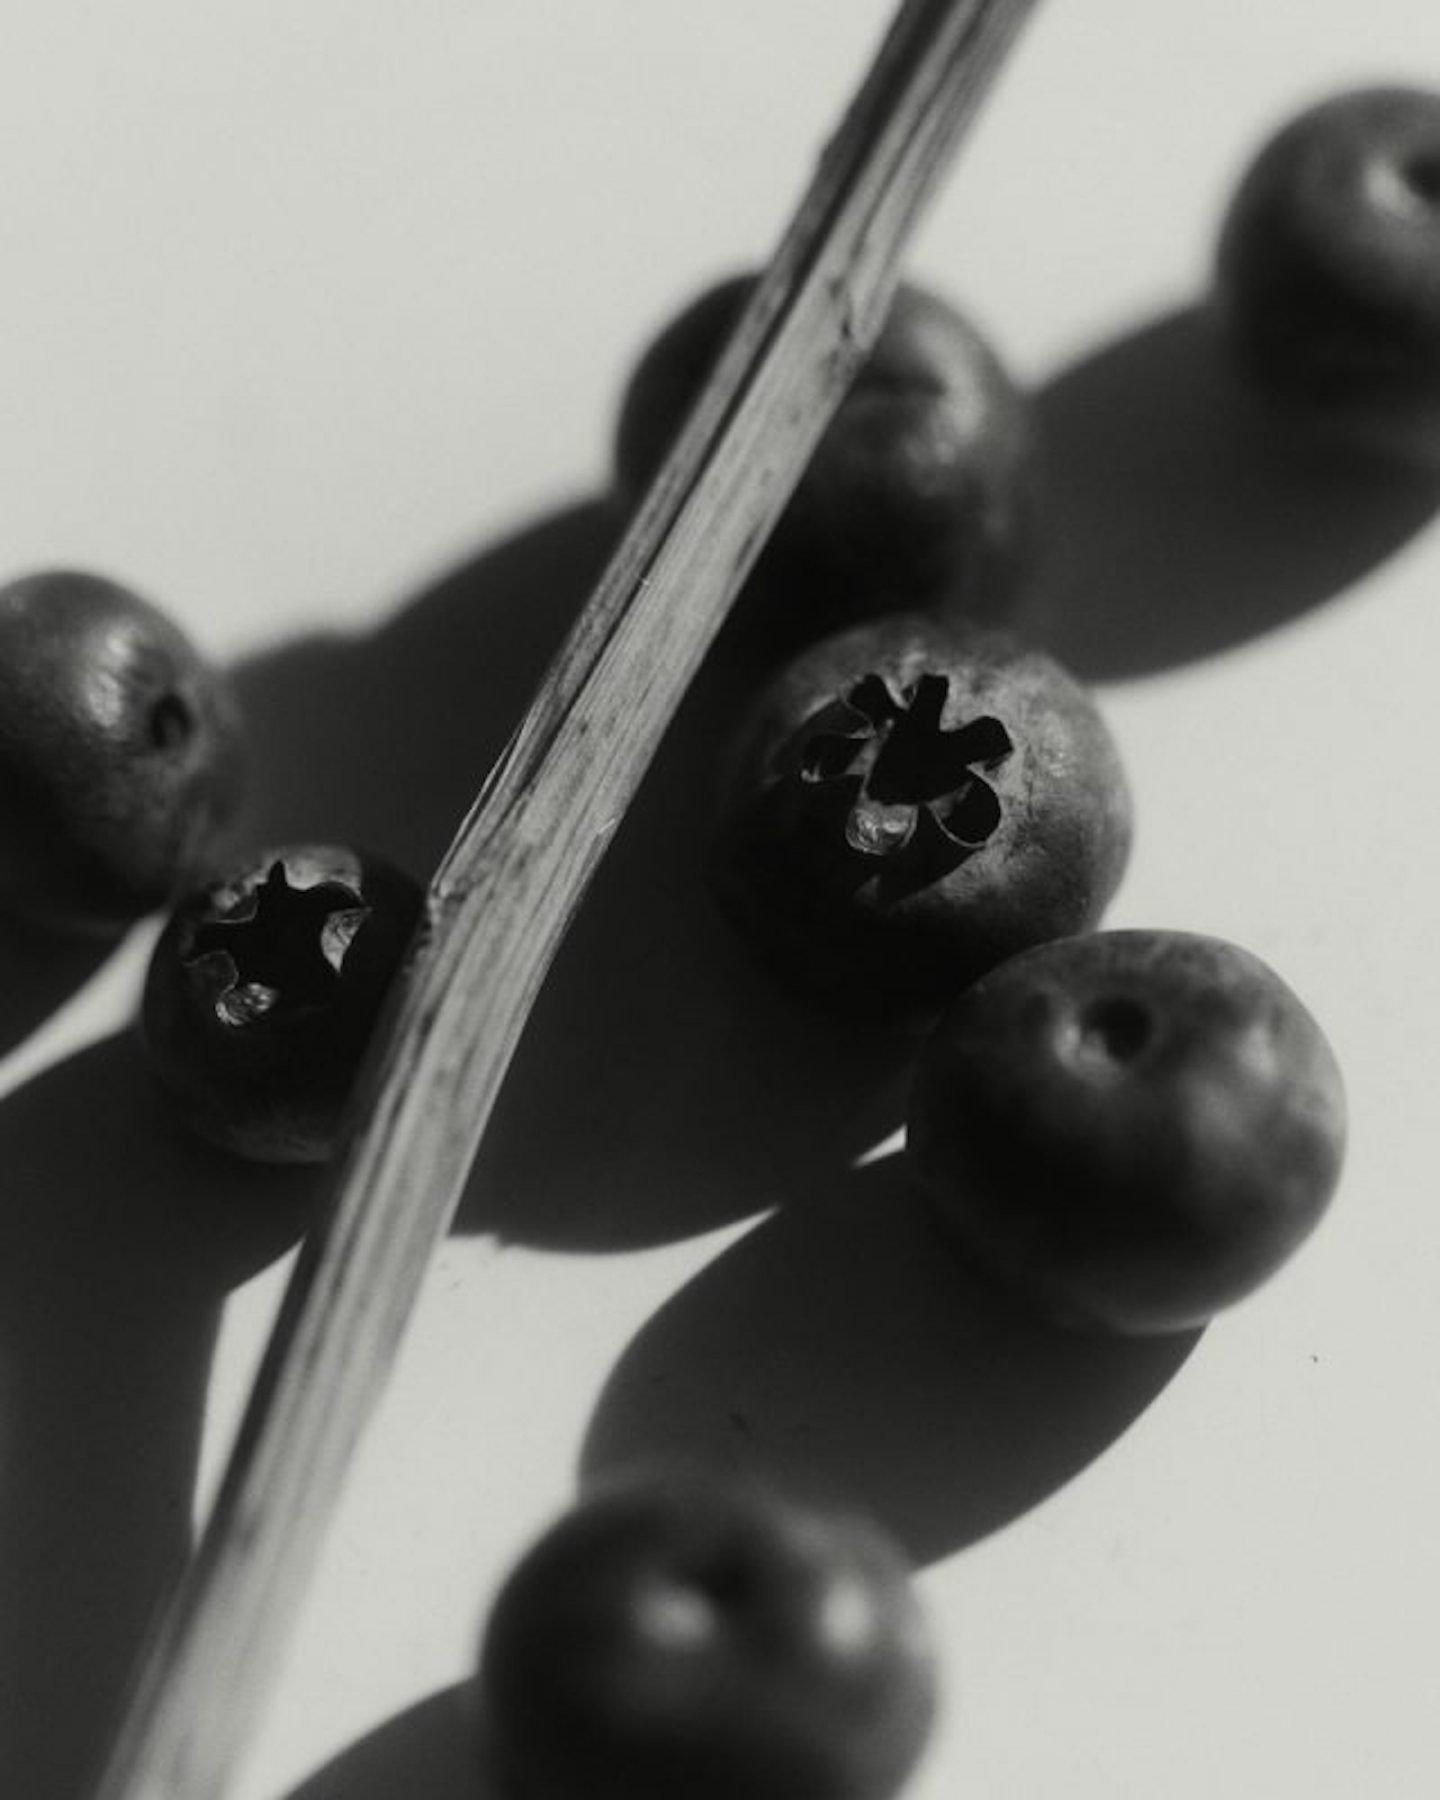 IGNANT-Photography-Ryan-Jenq-015